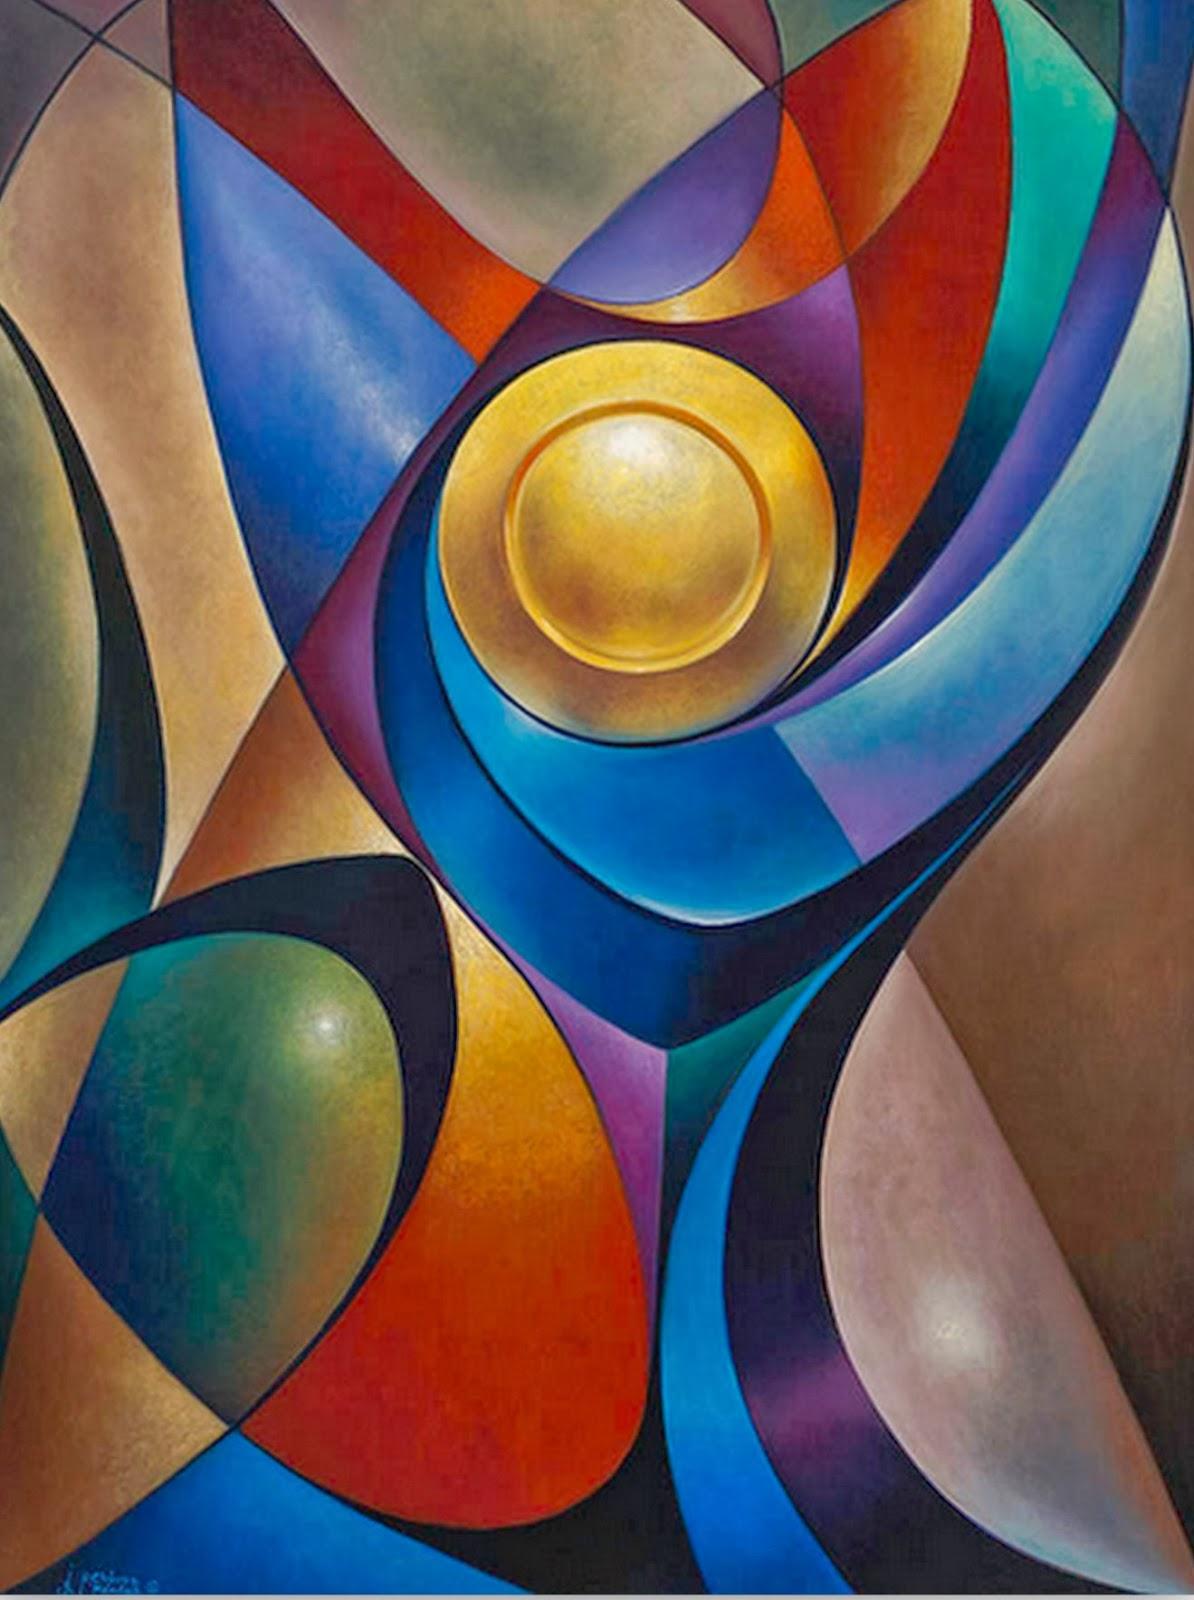 Pintura moderna y fotograf a art stica expresionismo for Trabajo para pintores